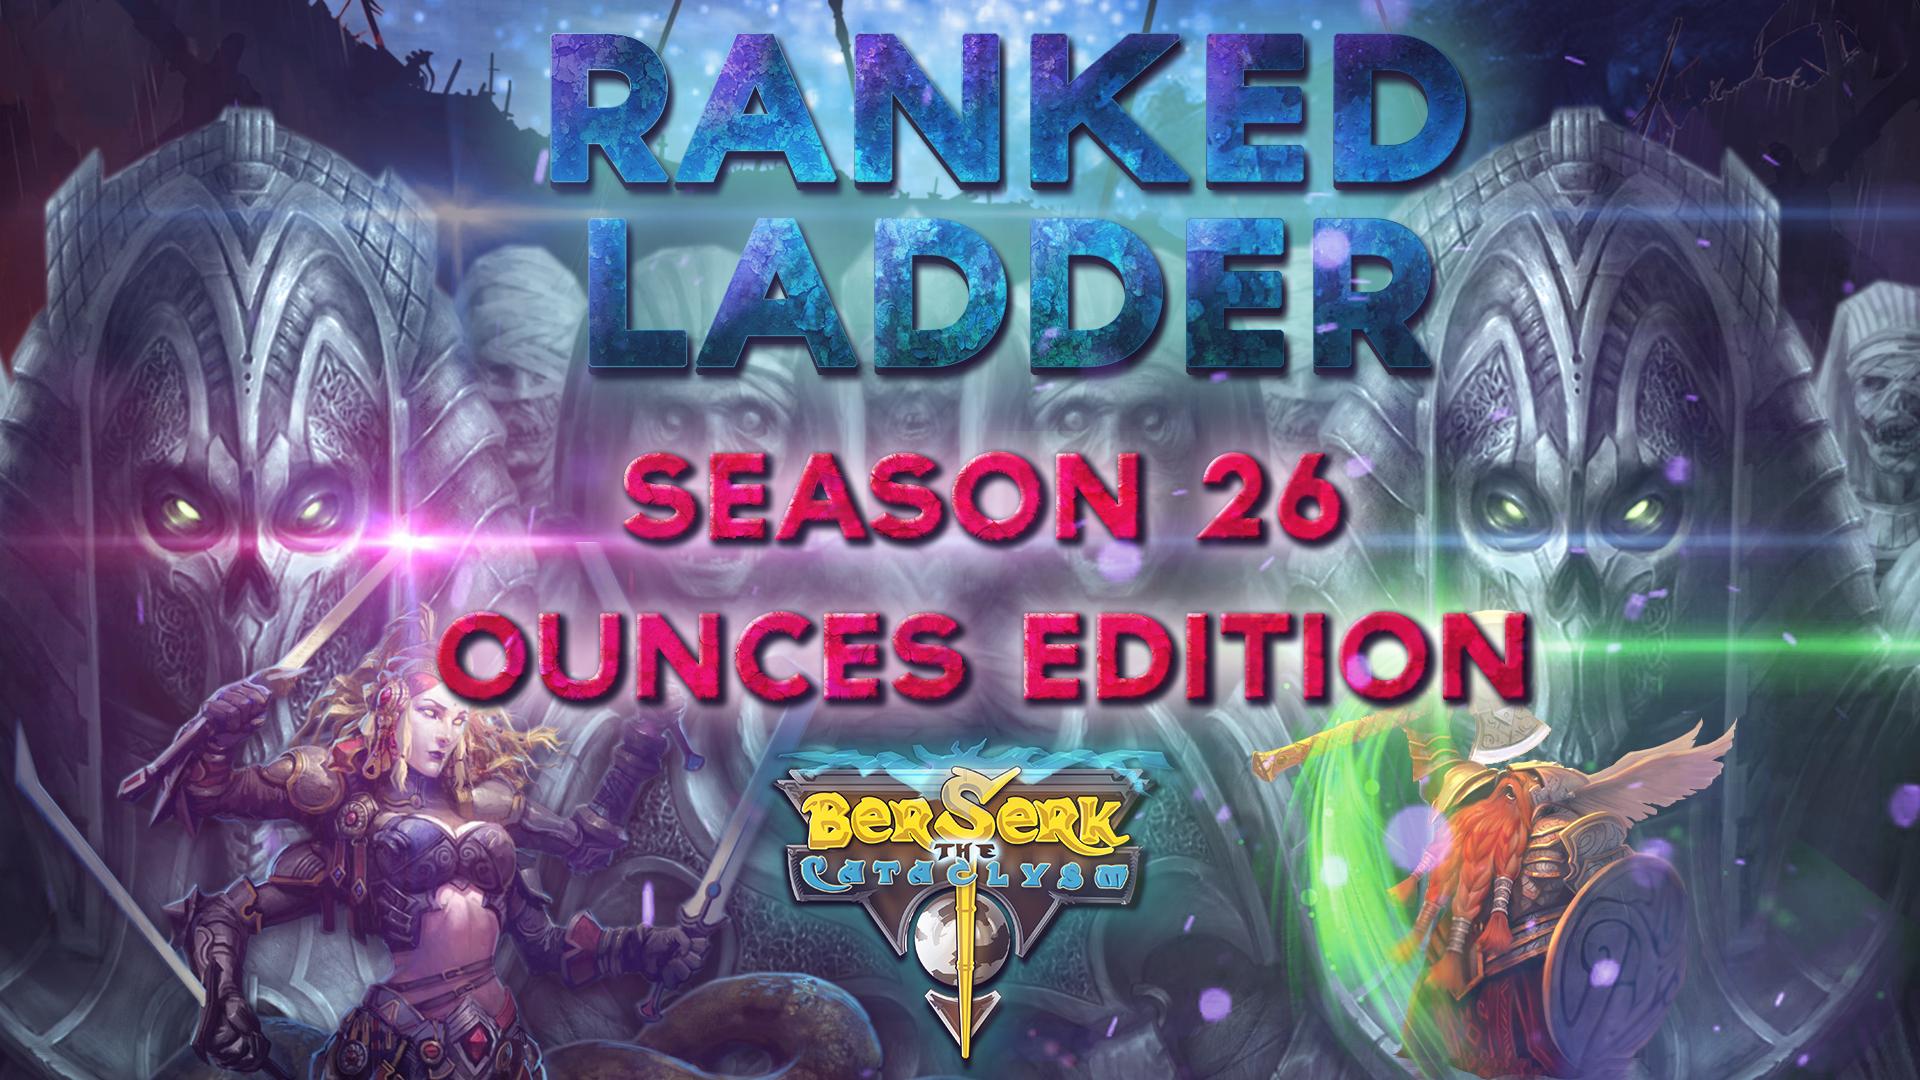 Ranked_LAdder_Season_26.jpg